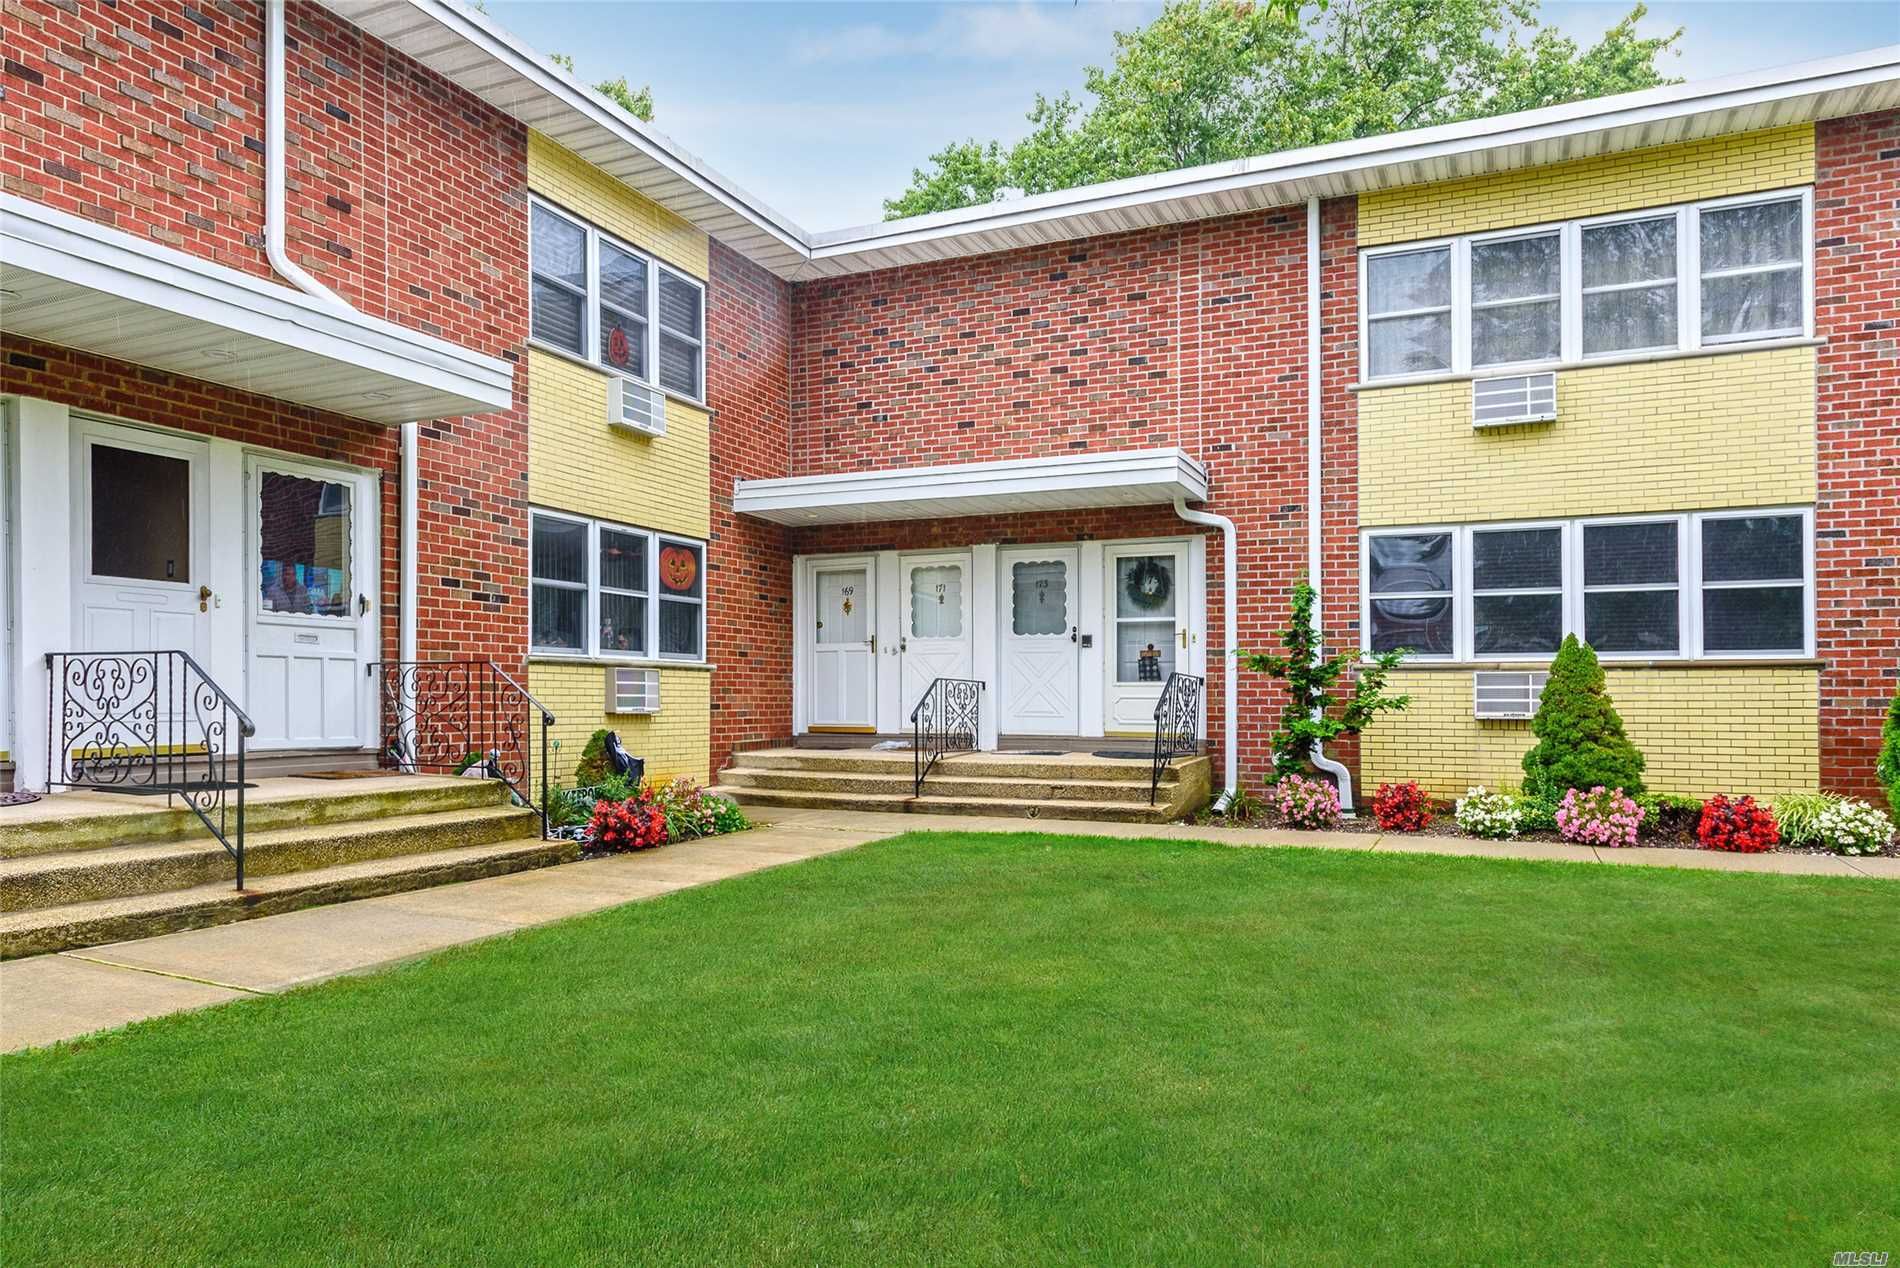 Property for sale at 169 Farber Dr, West Babylon,  NY 11704